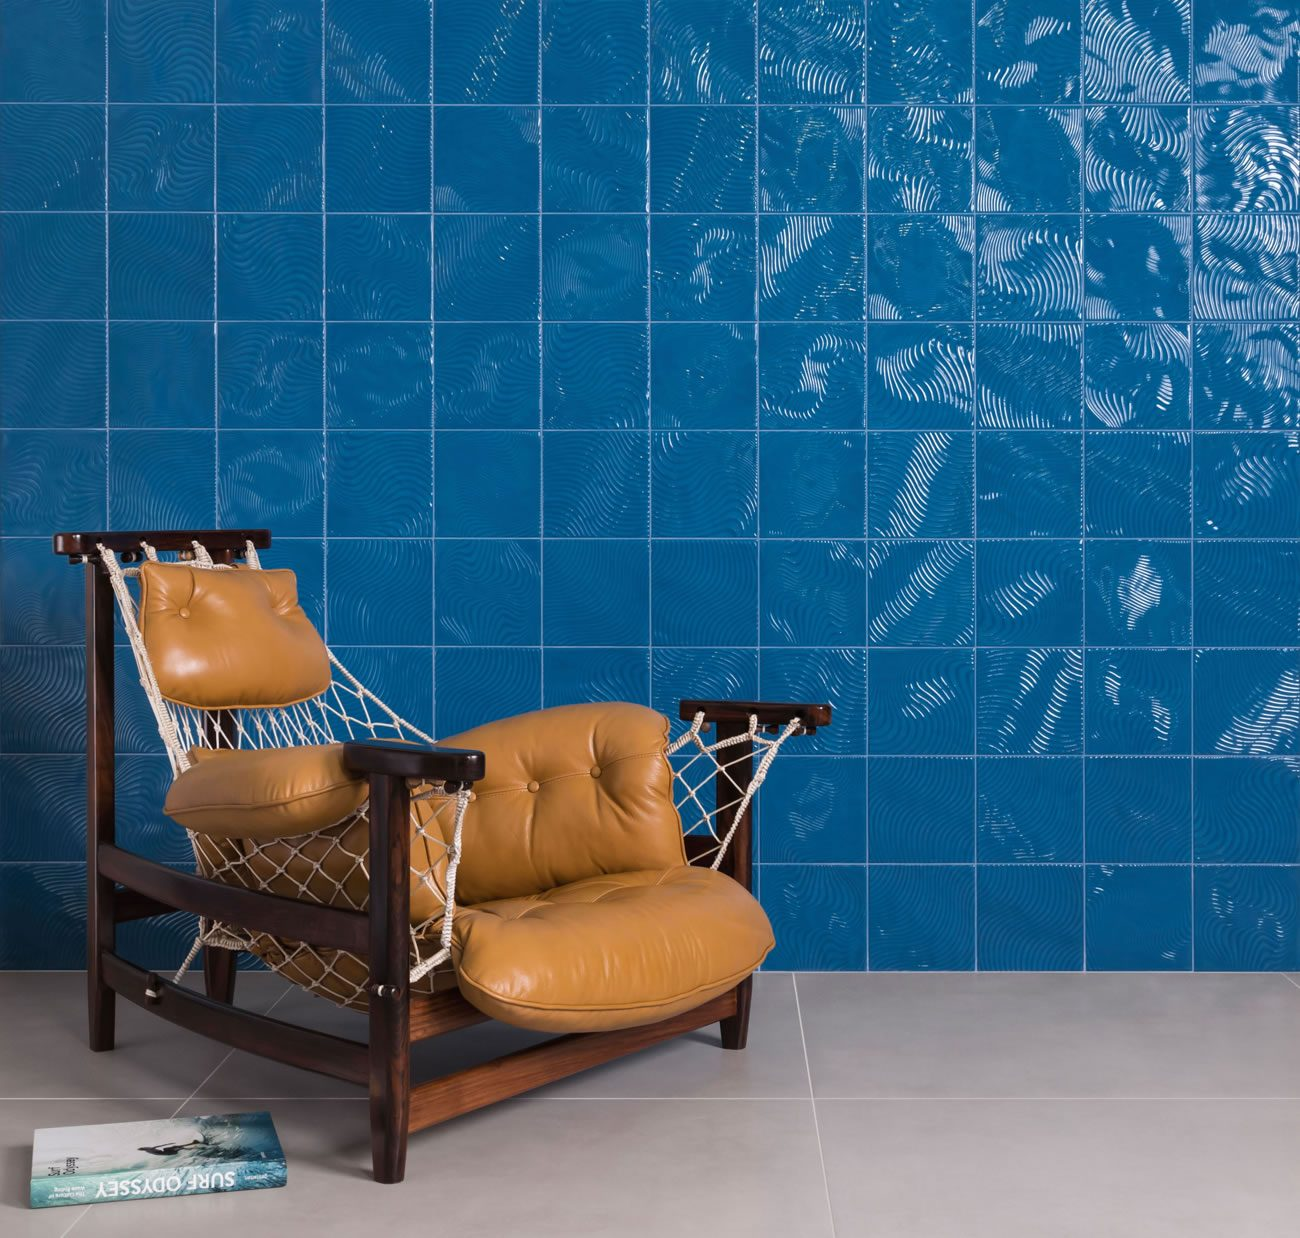 Ambiente Eliane: patch-wave-petroleo-br-20x20cm-munari-cimento-ext-90x90cm-amb-02